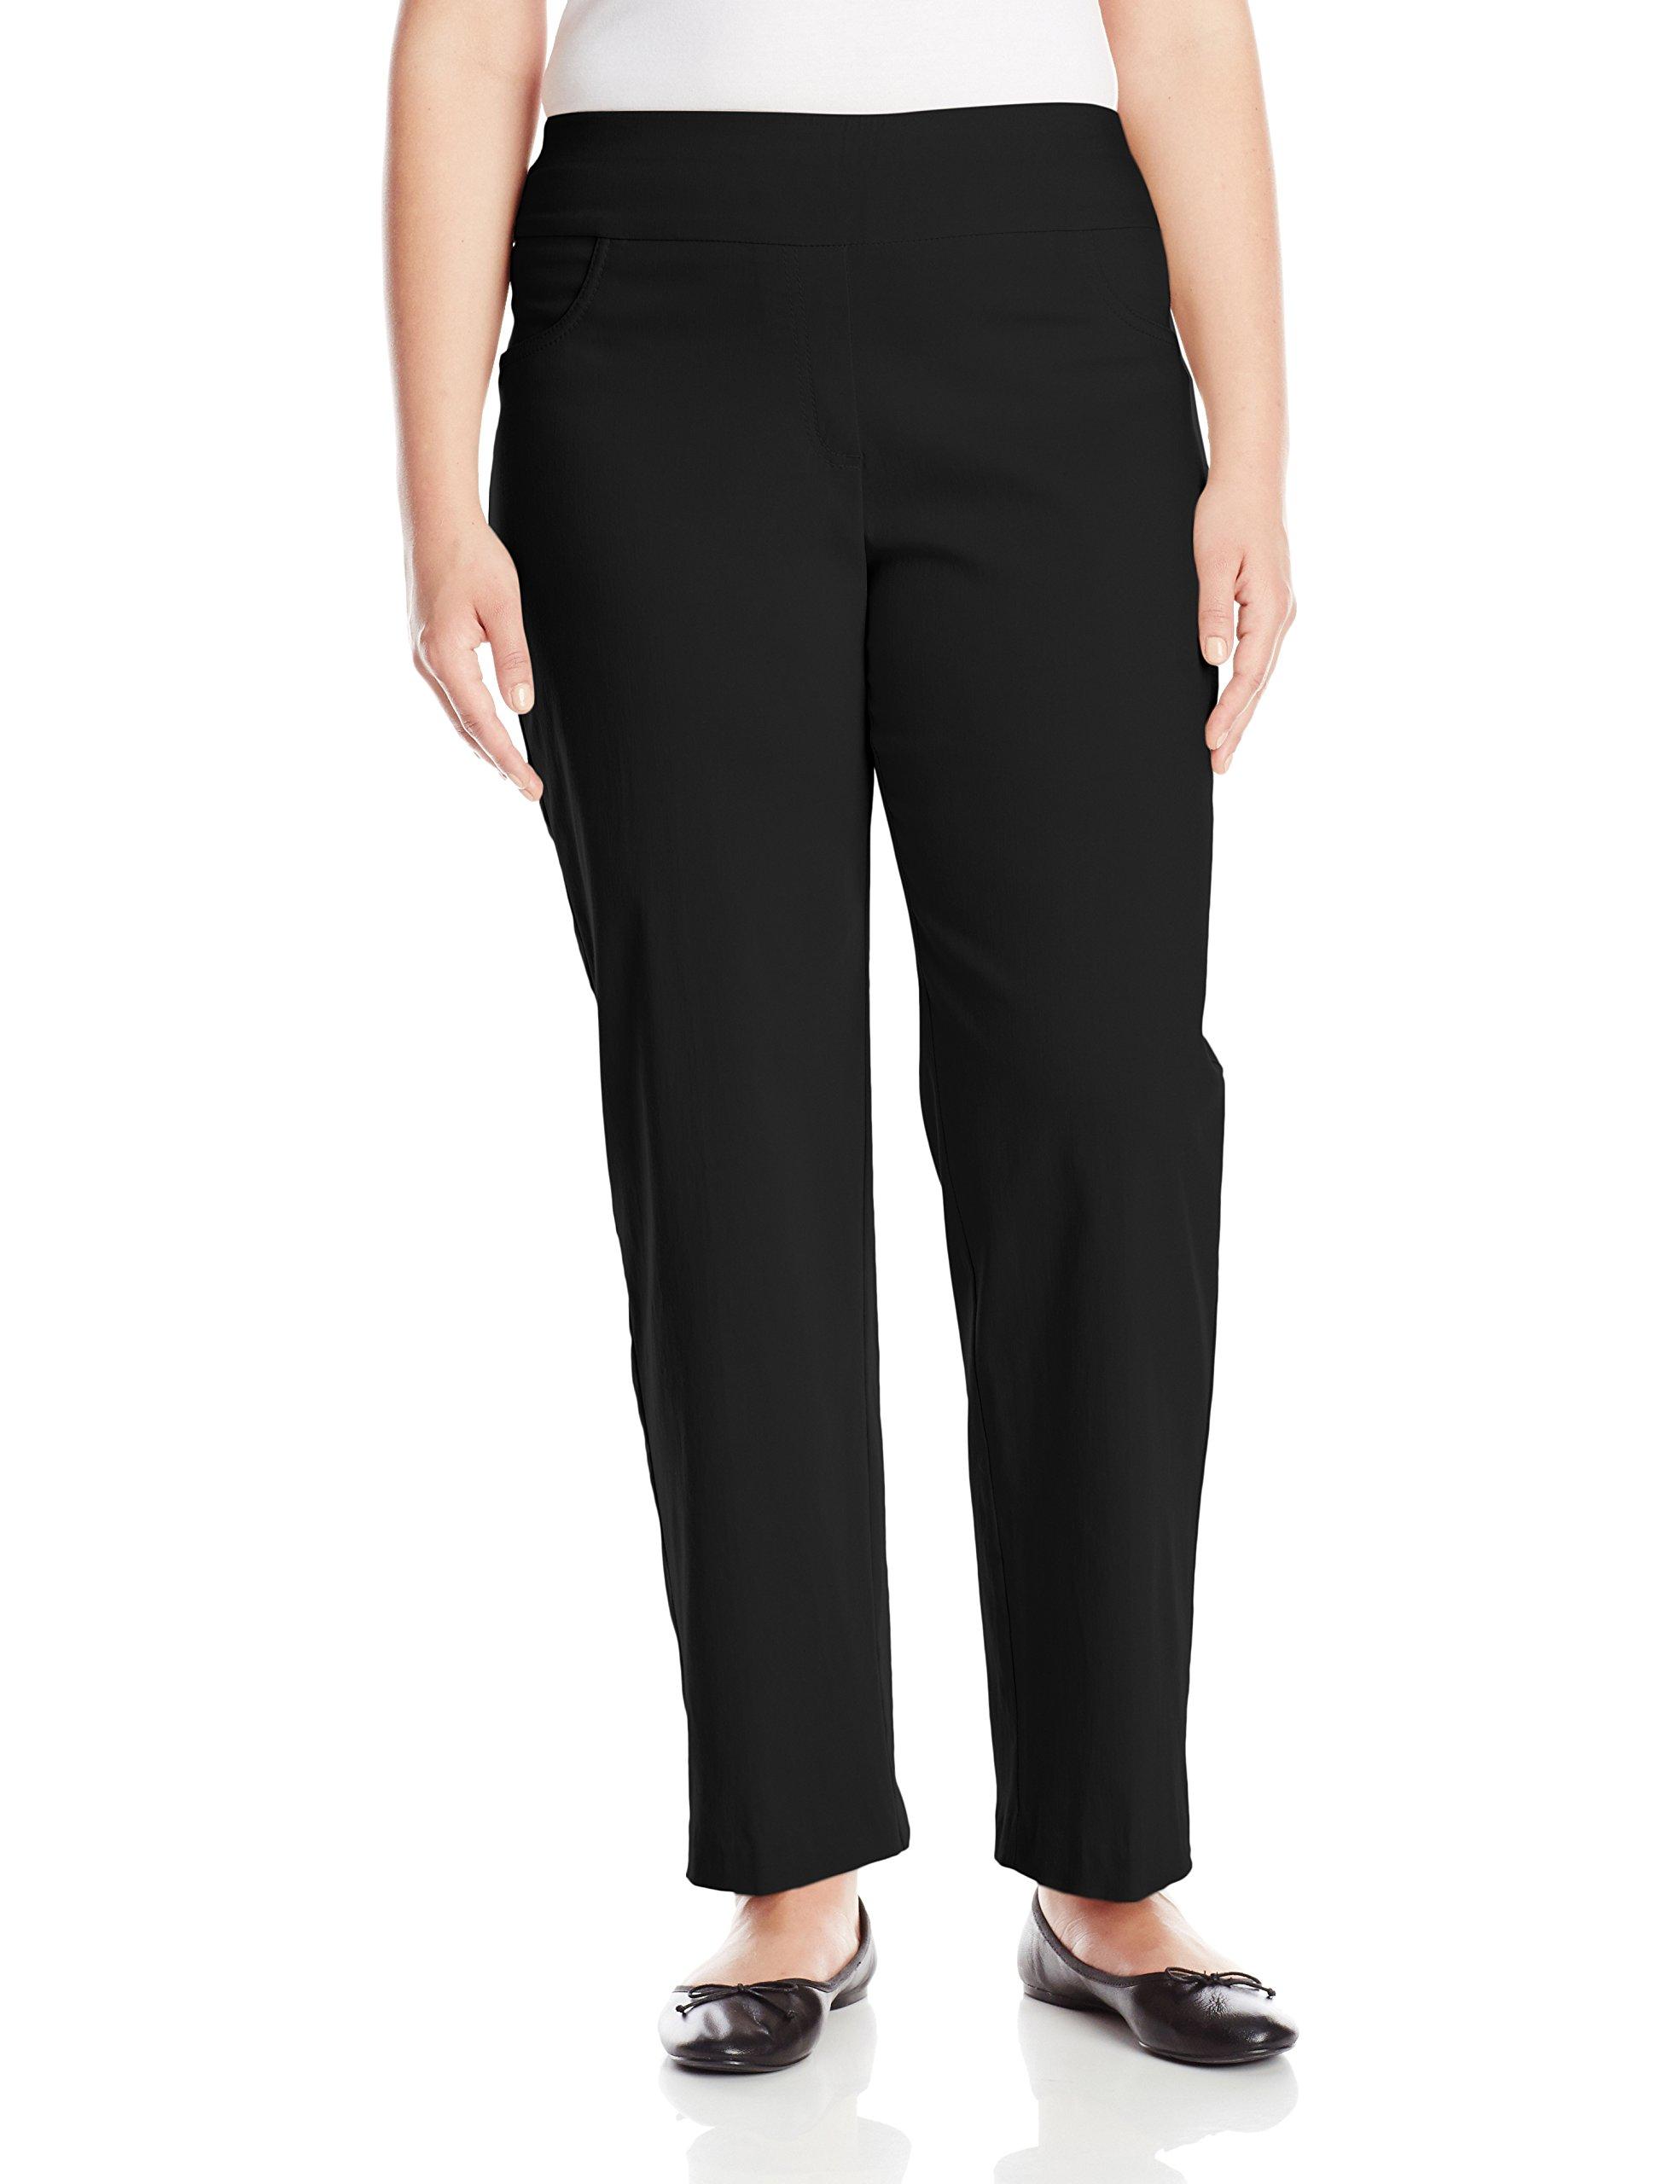 Ruby Rd. Women's Plus-Size Plus Pull-On Solar Millennium Super Stretch Pant, Black, 16W